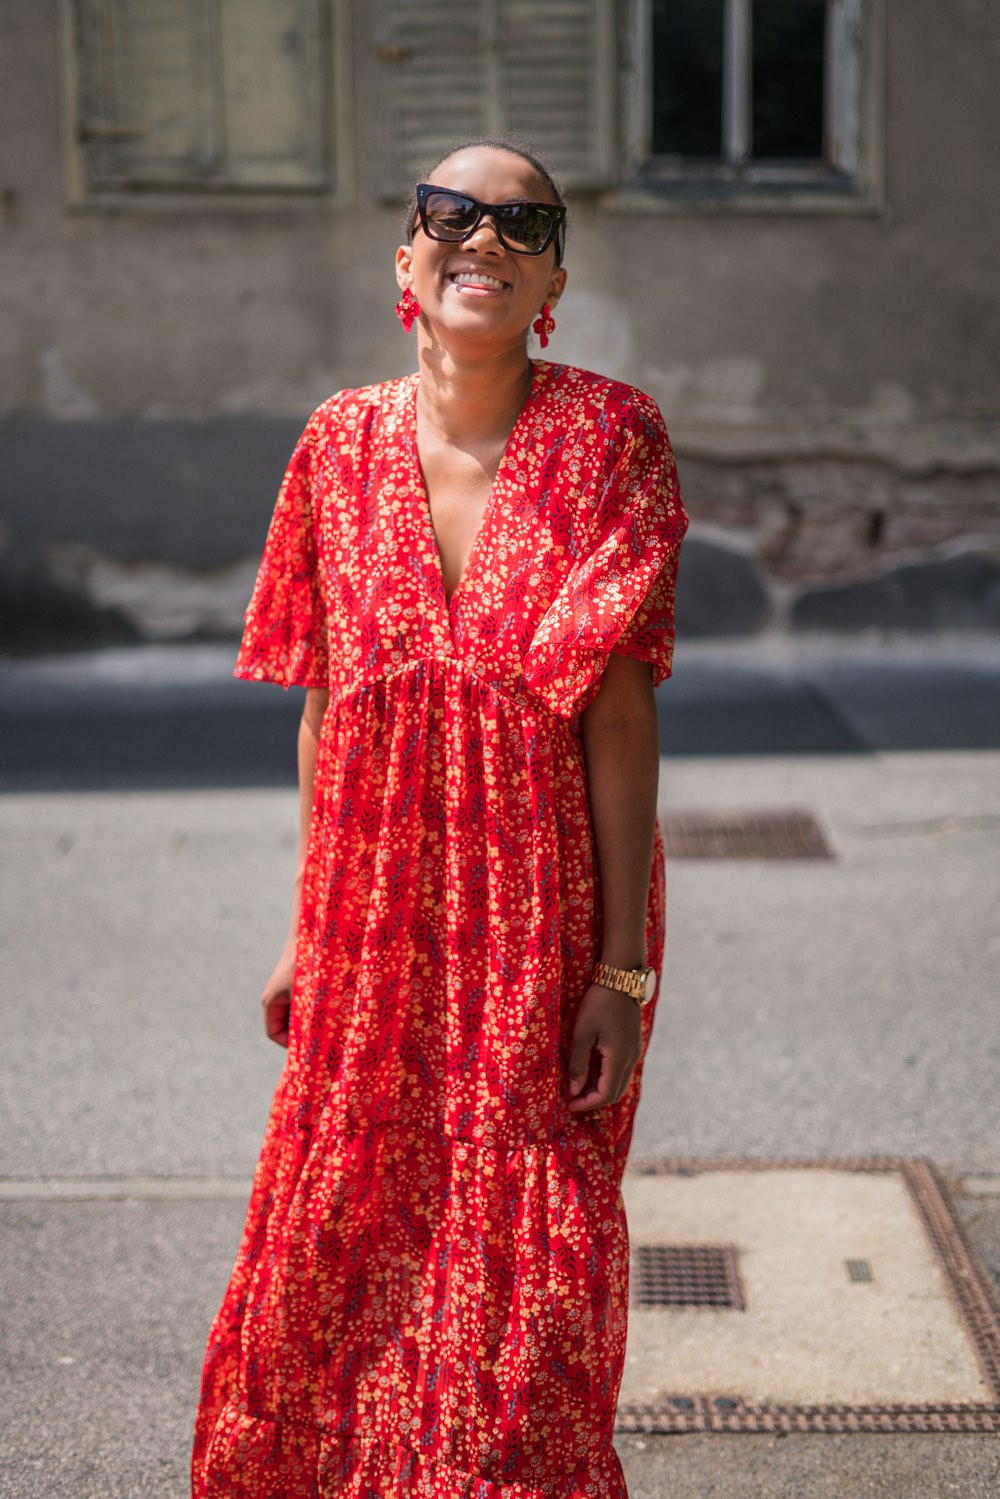 German fashion blogger wearing a maxi dress in fall